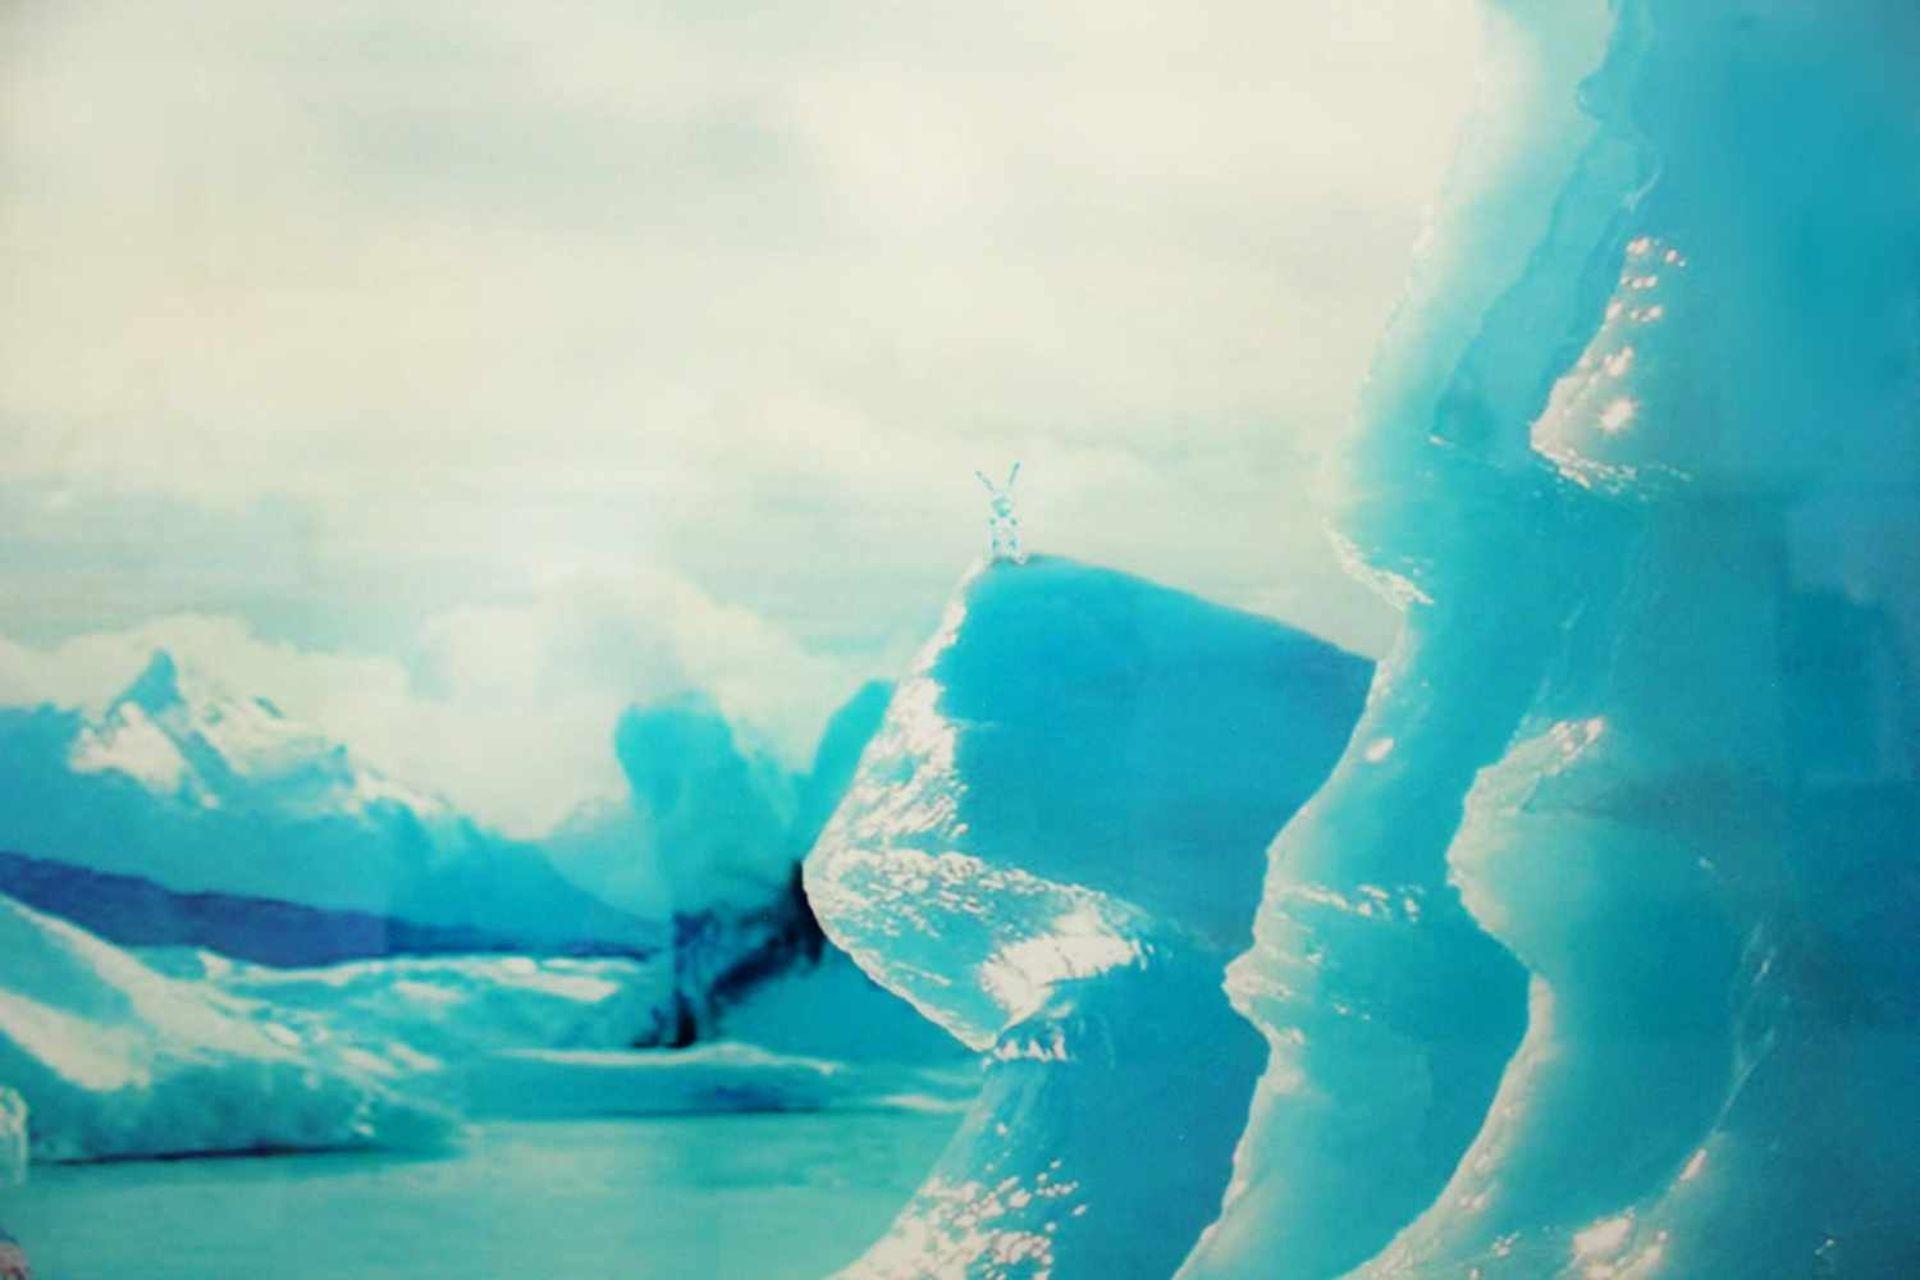 Helmut Grill geb. 1965 The Frozen Discoverer 2011 Fotografie hinter Acrylglas signiert, betitelt, - Bild 3 aus 4